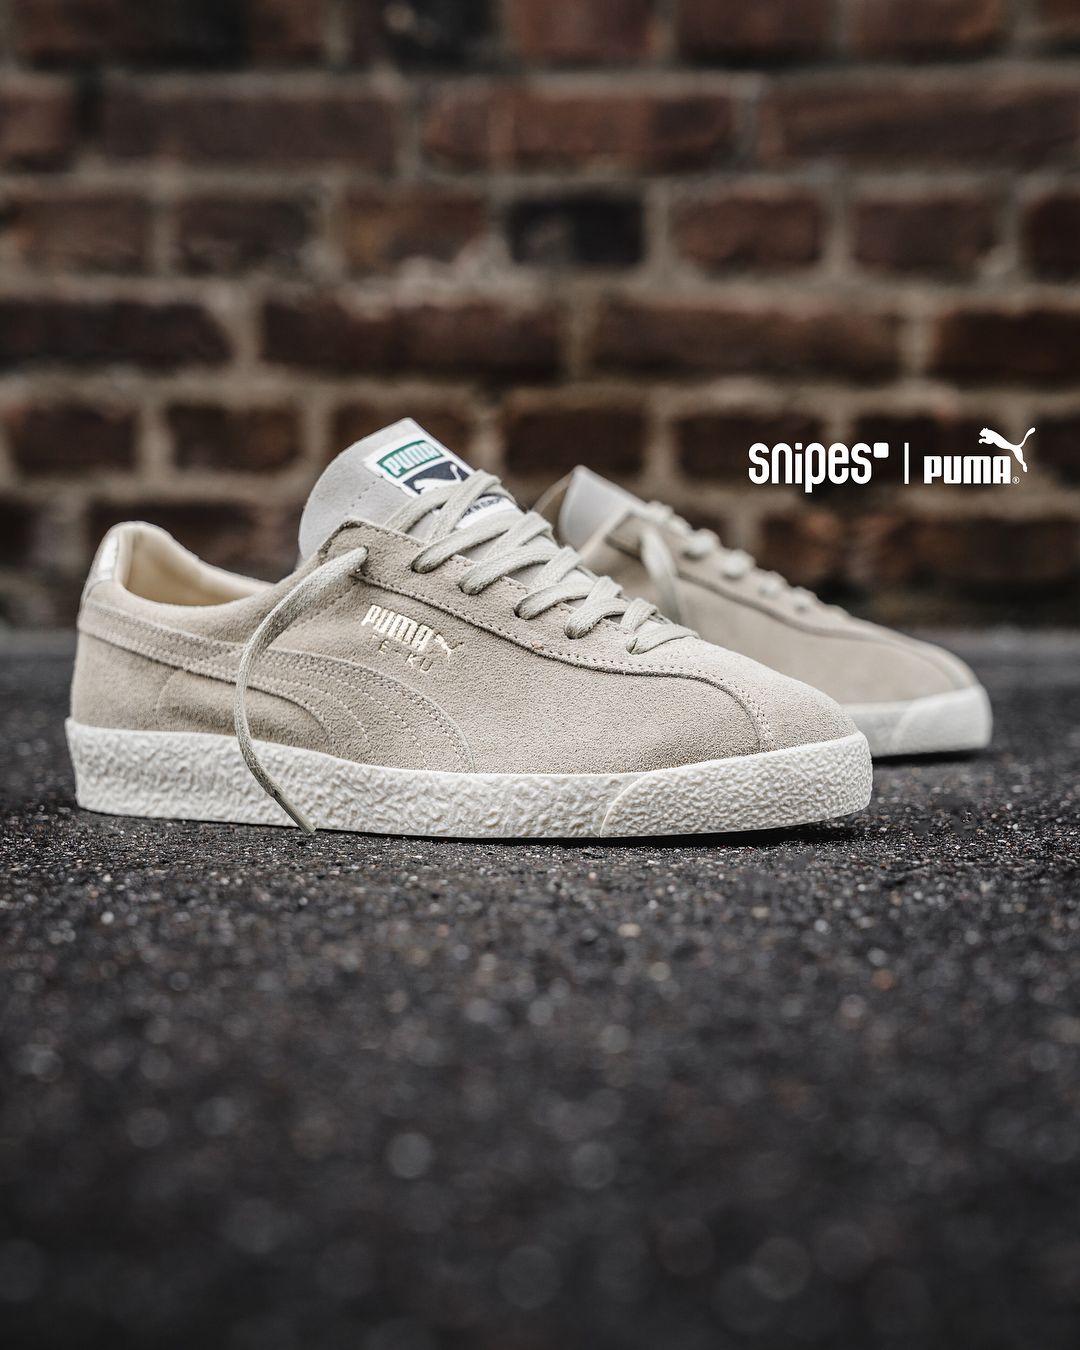 Puma Teku   Sneakers, Men's shoes, Adidas sneakers